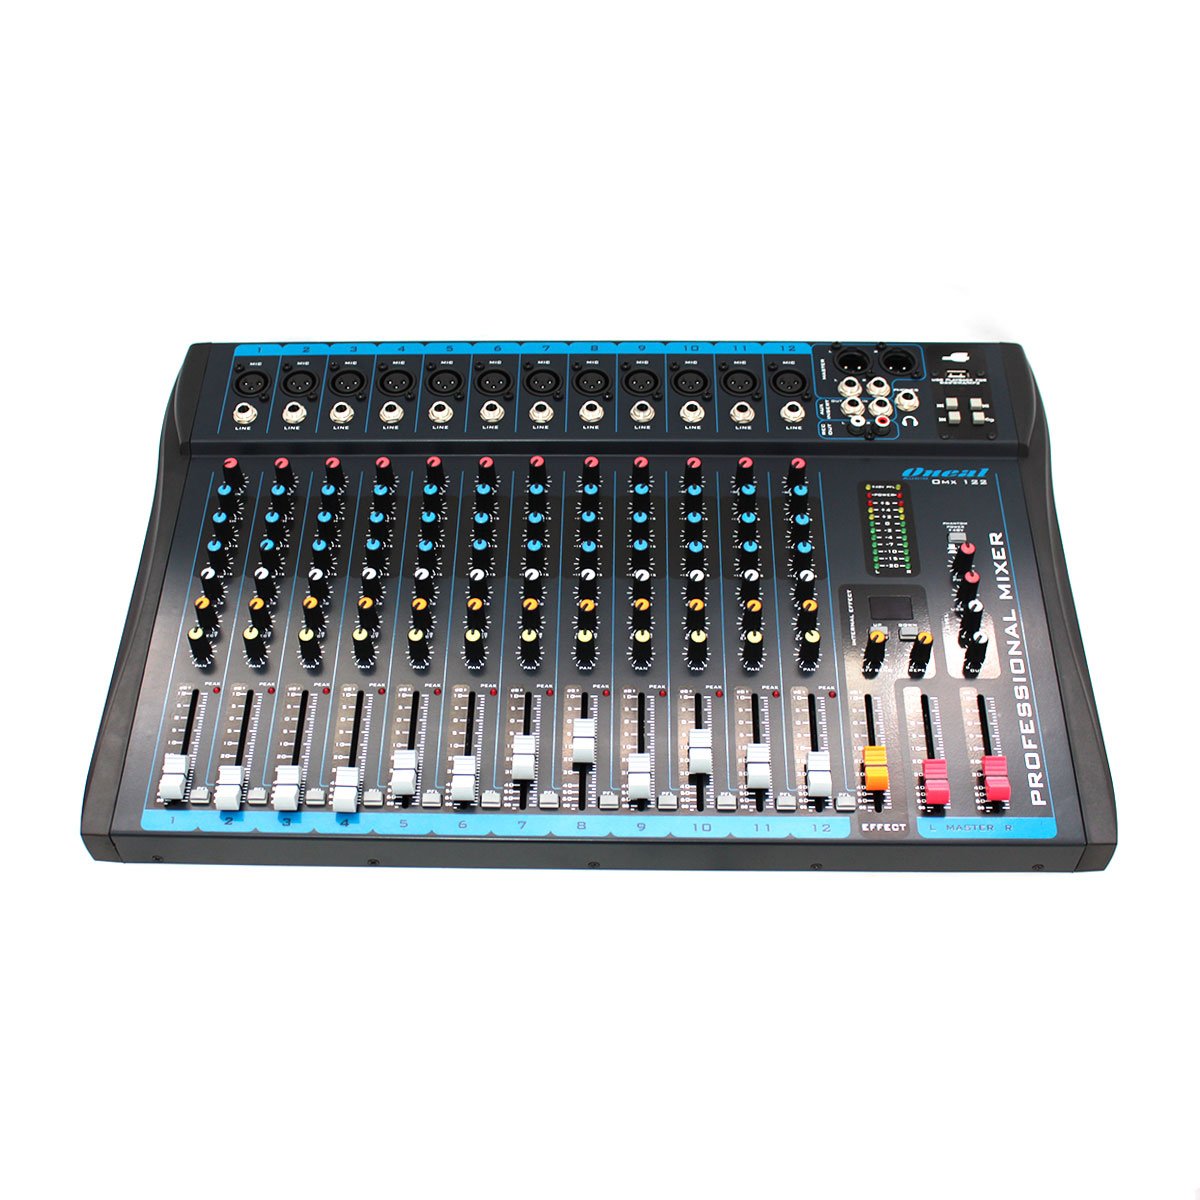 Mesa de Som 12 Canais XLR Balanceados c/ USB / Efeito / 1 Auxiliar - OMX 122 Oneal